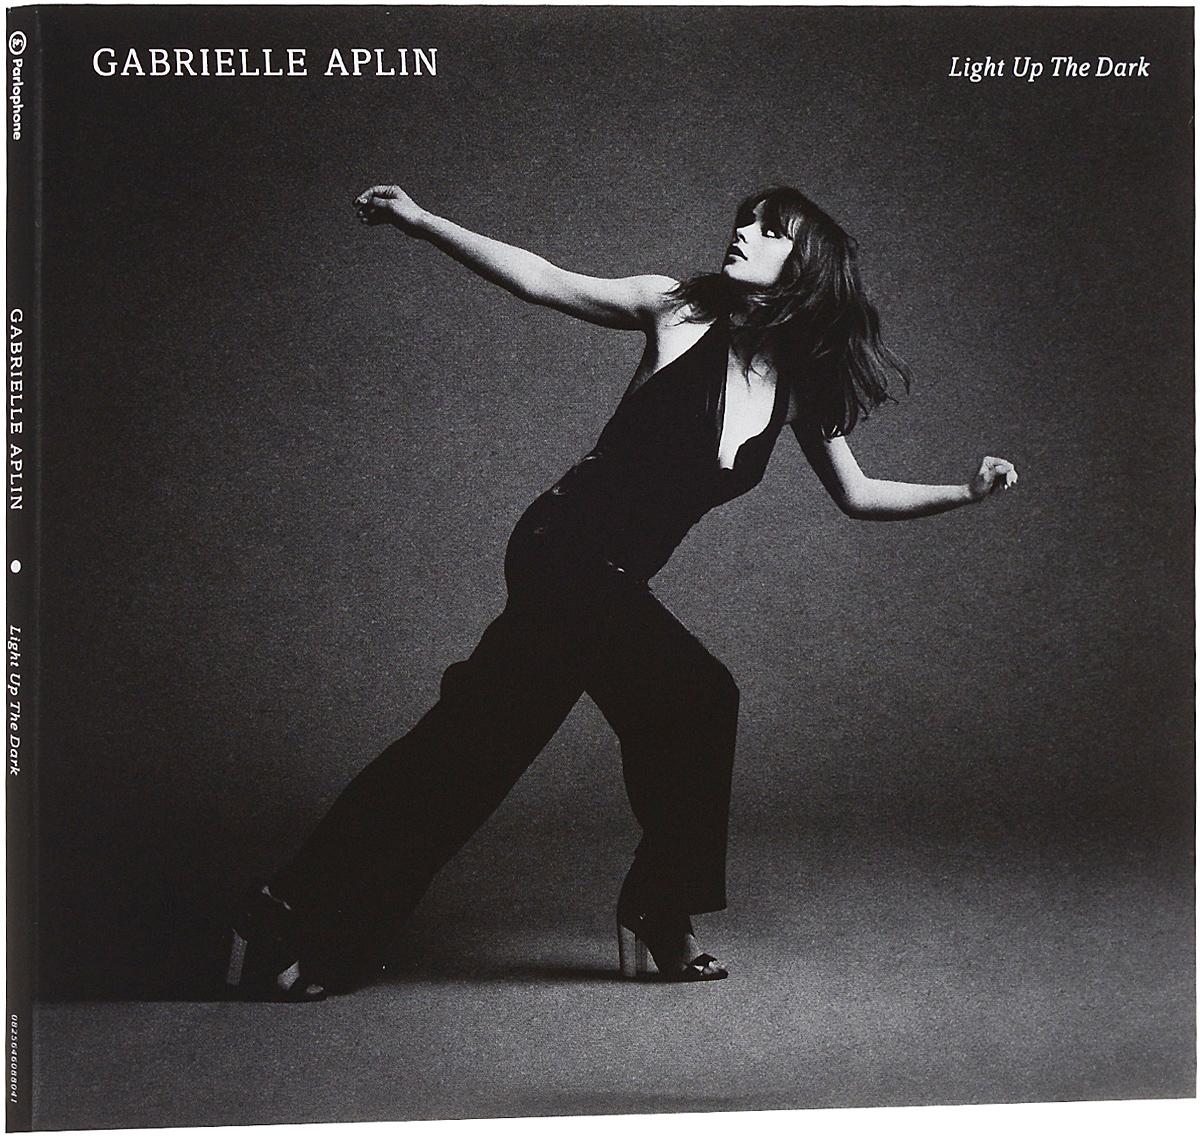 купить Габриель Эплин Gabrielle Aplin. Light Up The Dark. Deluxe Edition (2 CD) по цене 891 рублей